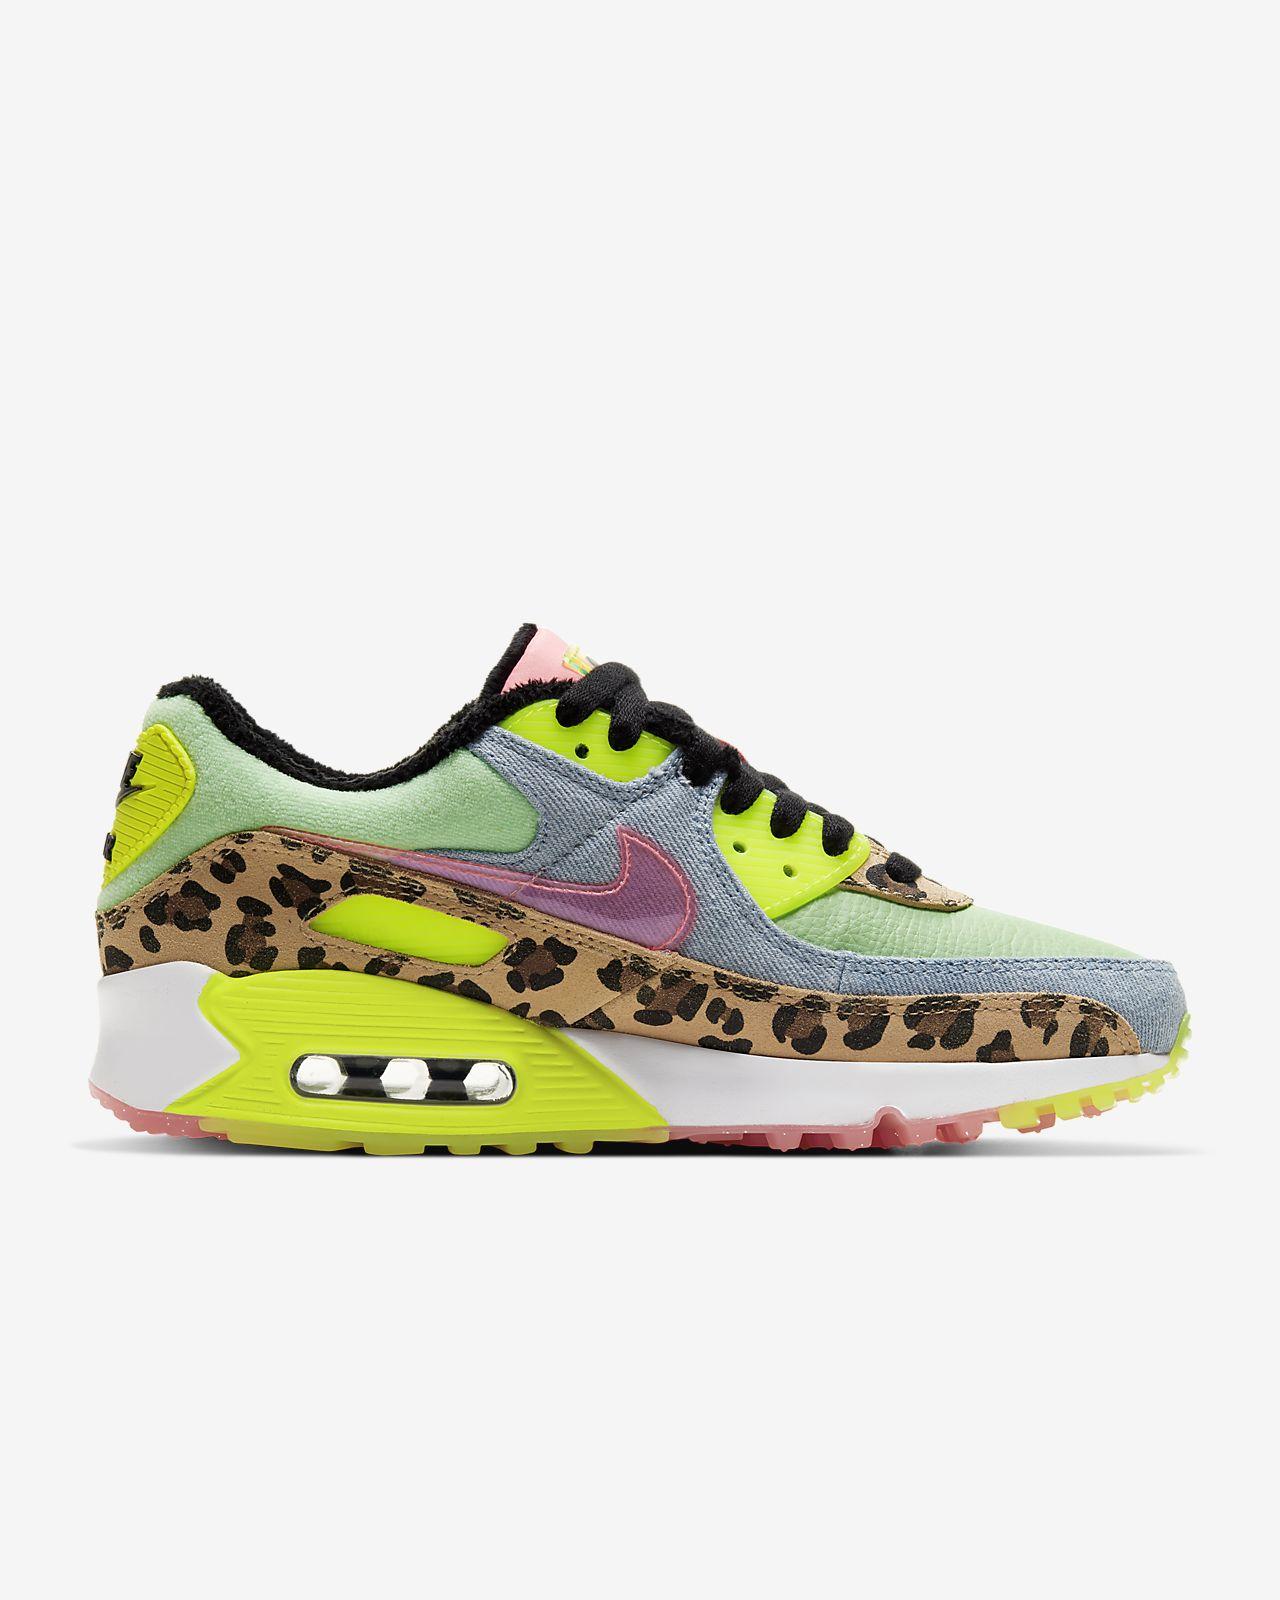 Sapatilhas Nike Air Max 90 LX para mulher